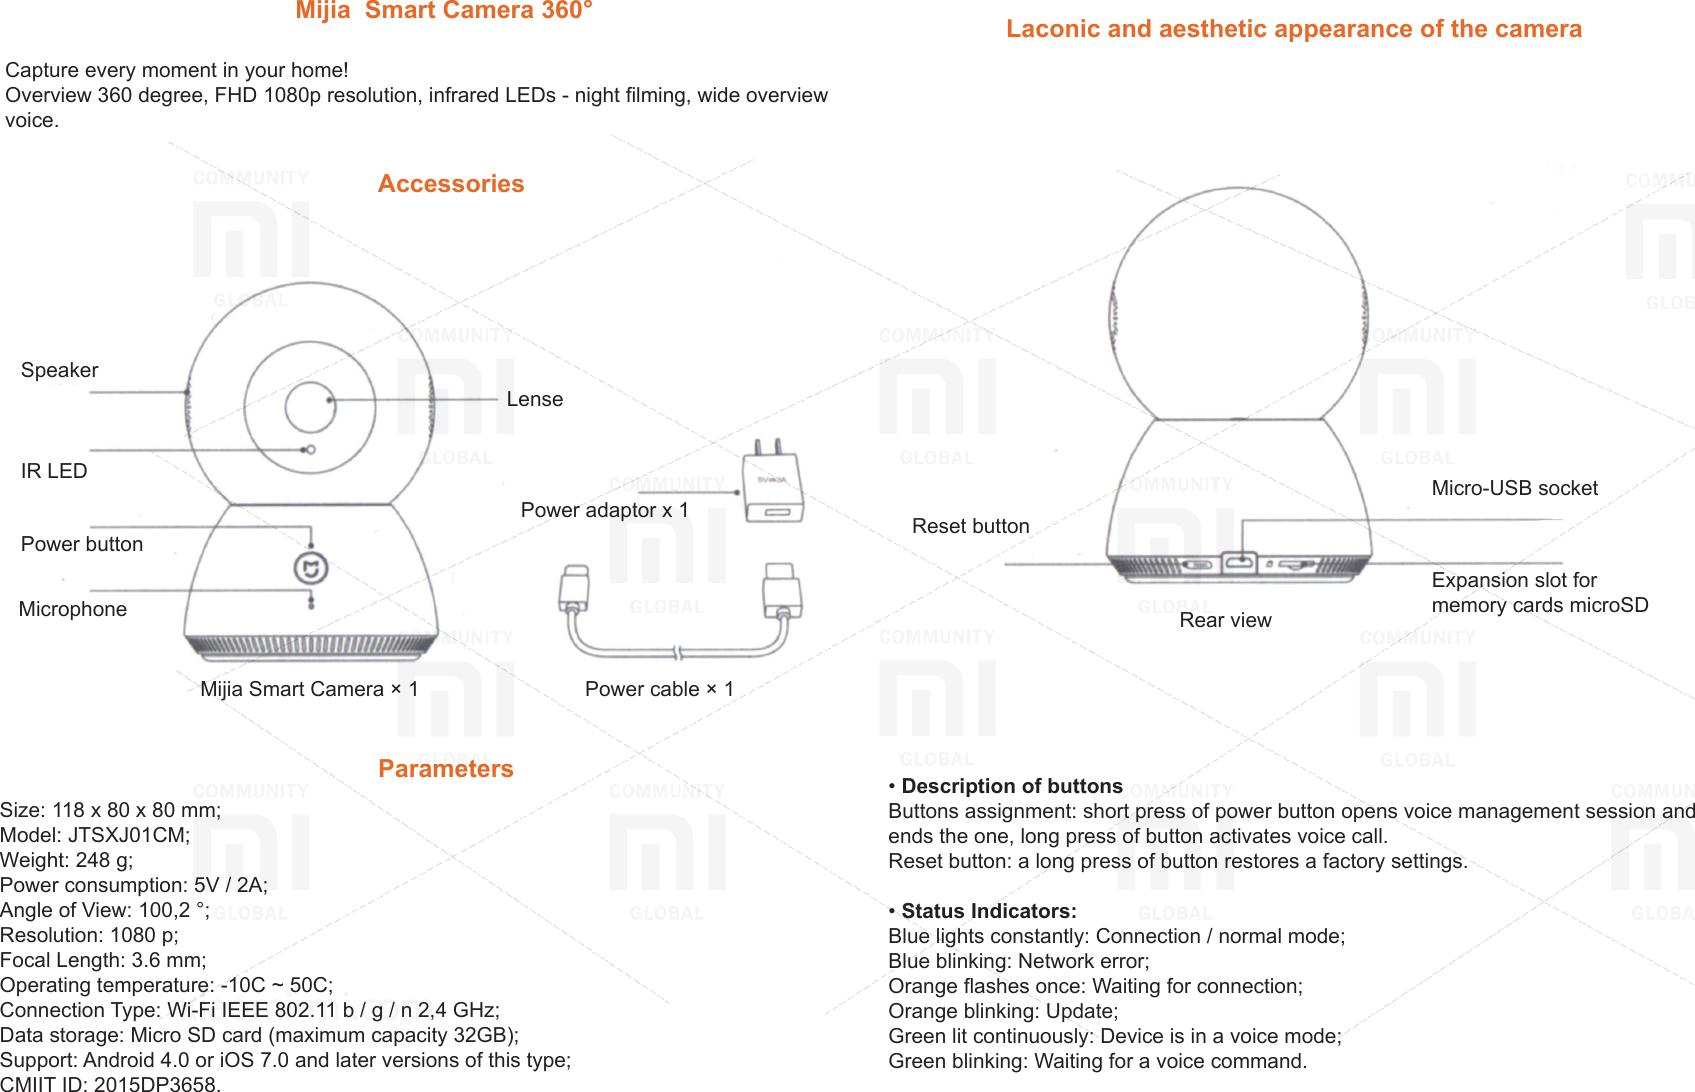 Xiaomi Mijia Smart Camera 360 EN